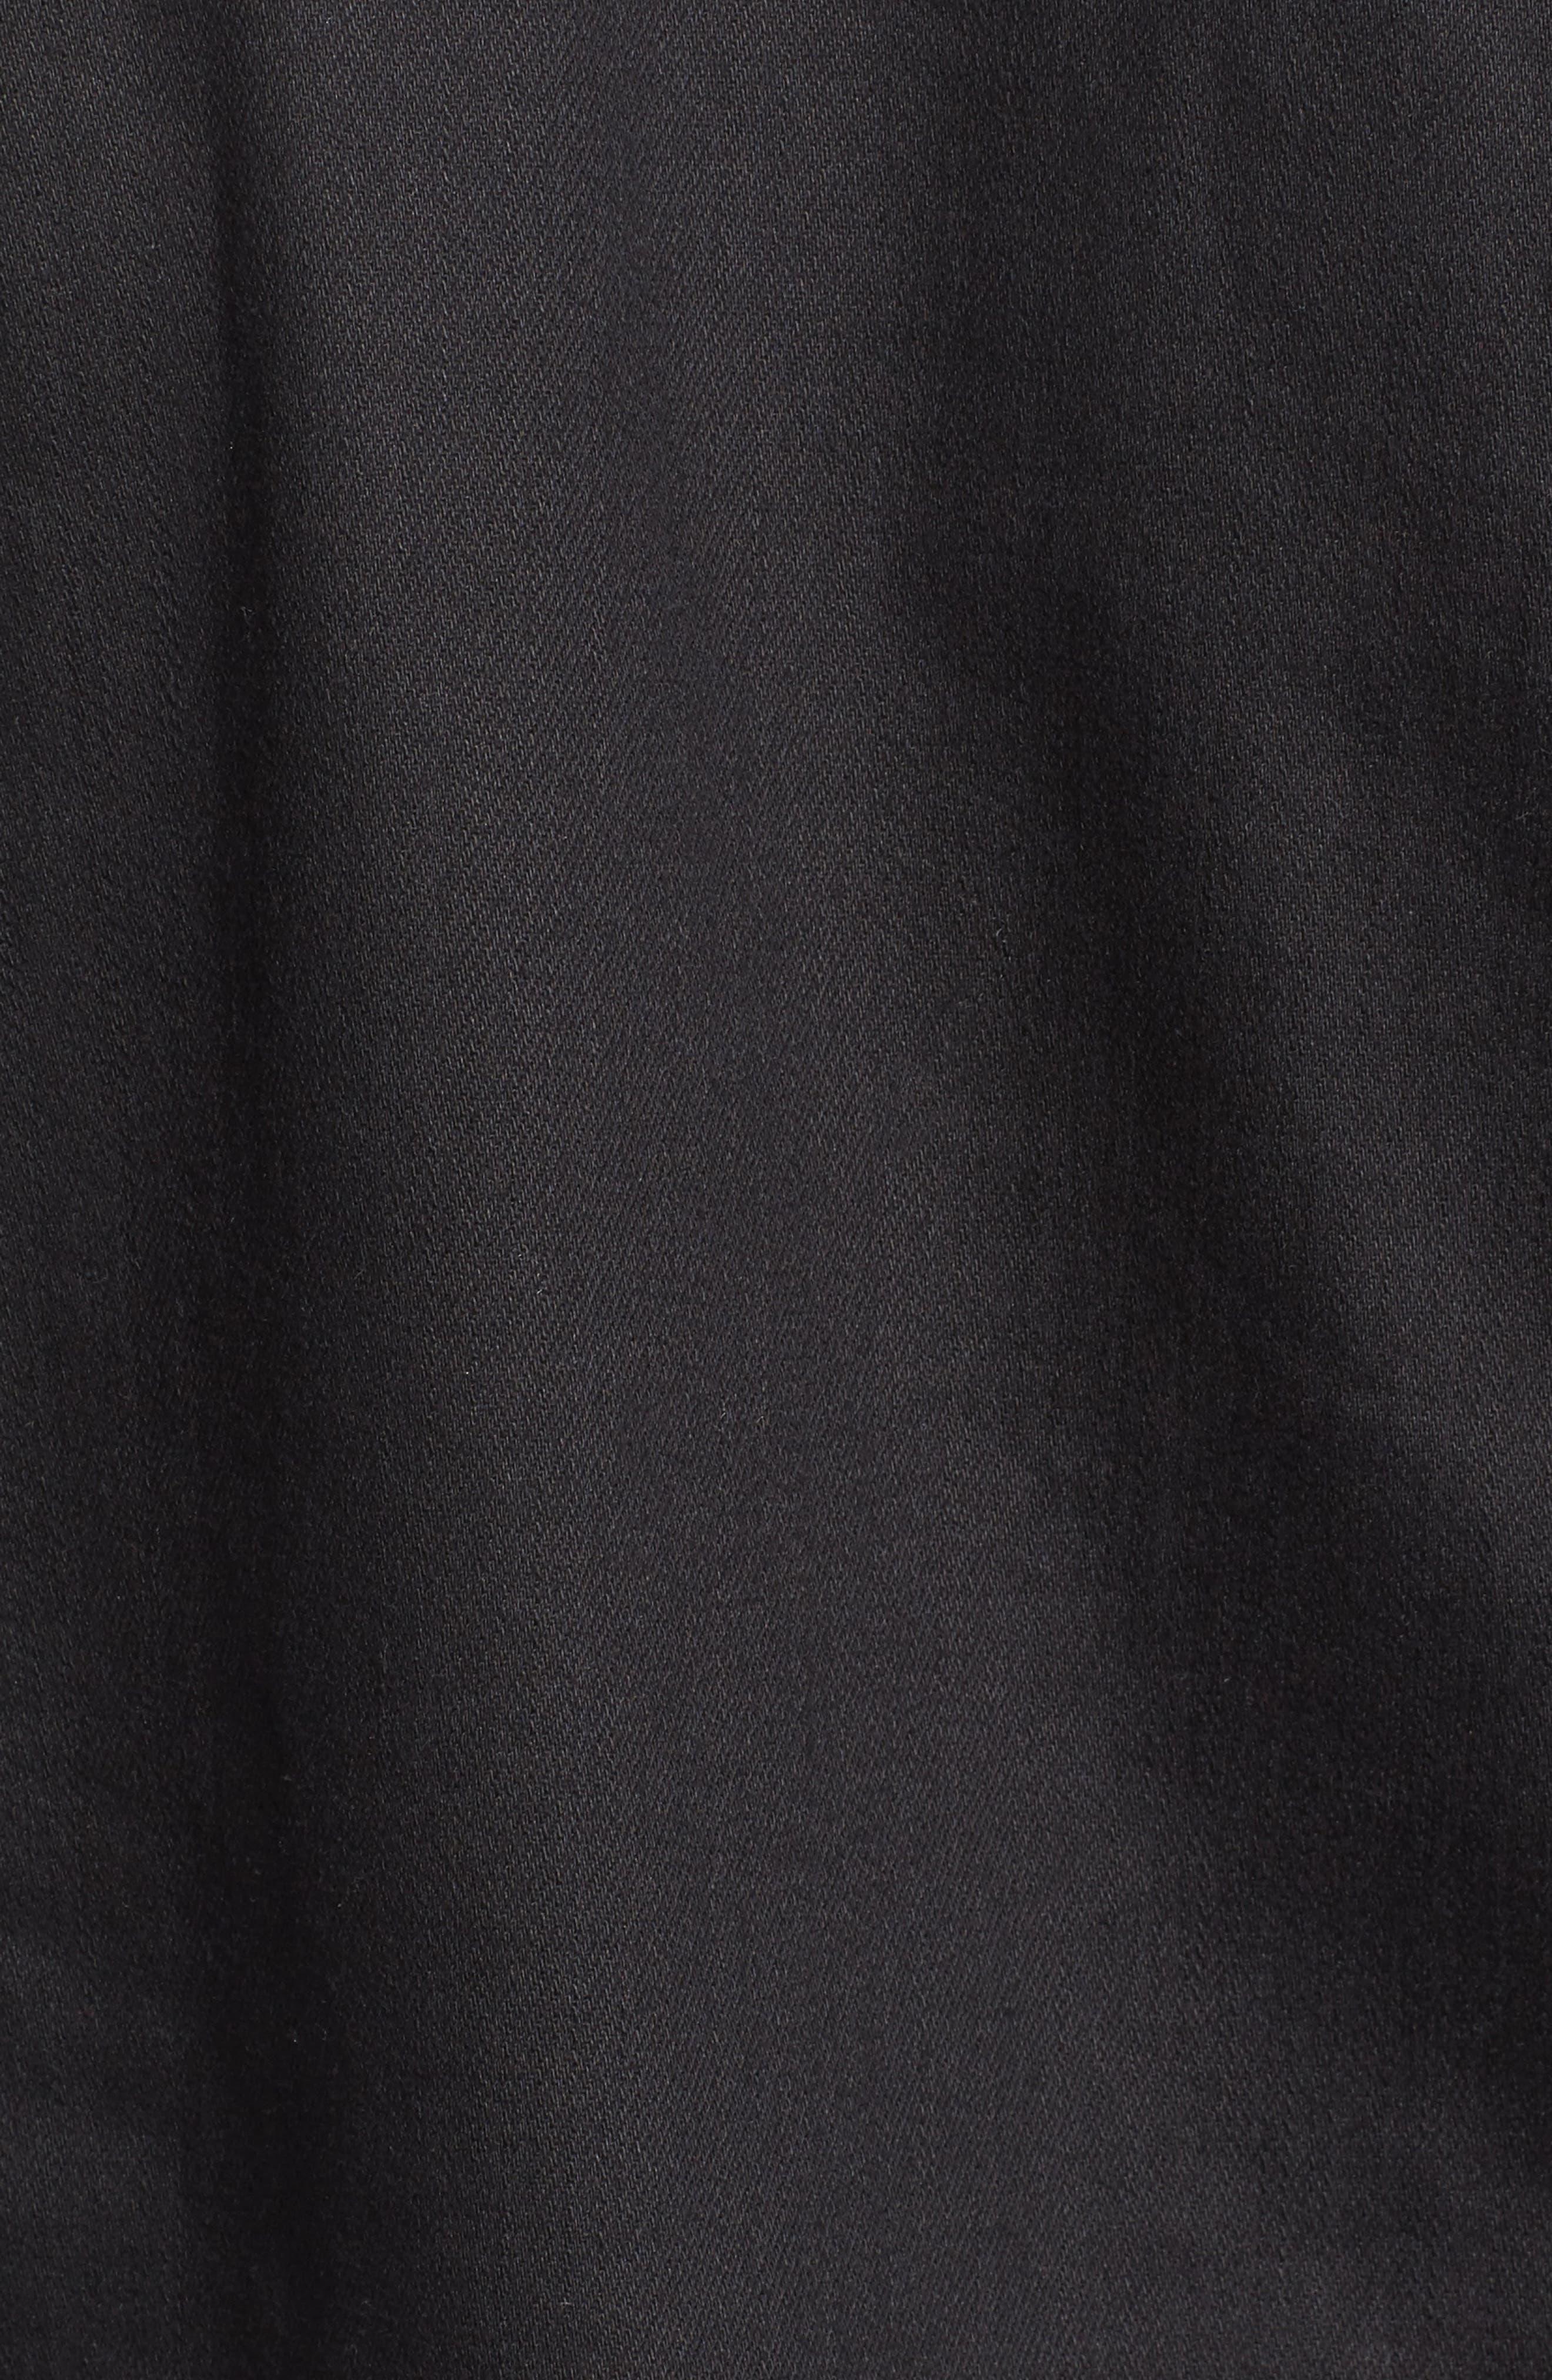 Dwight Denim Jacket,                             Alternate thumbnail 5, color,                             Black Damage